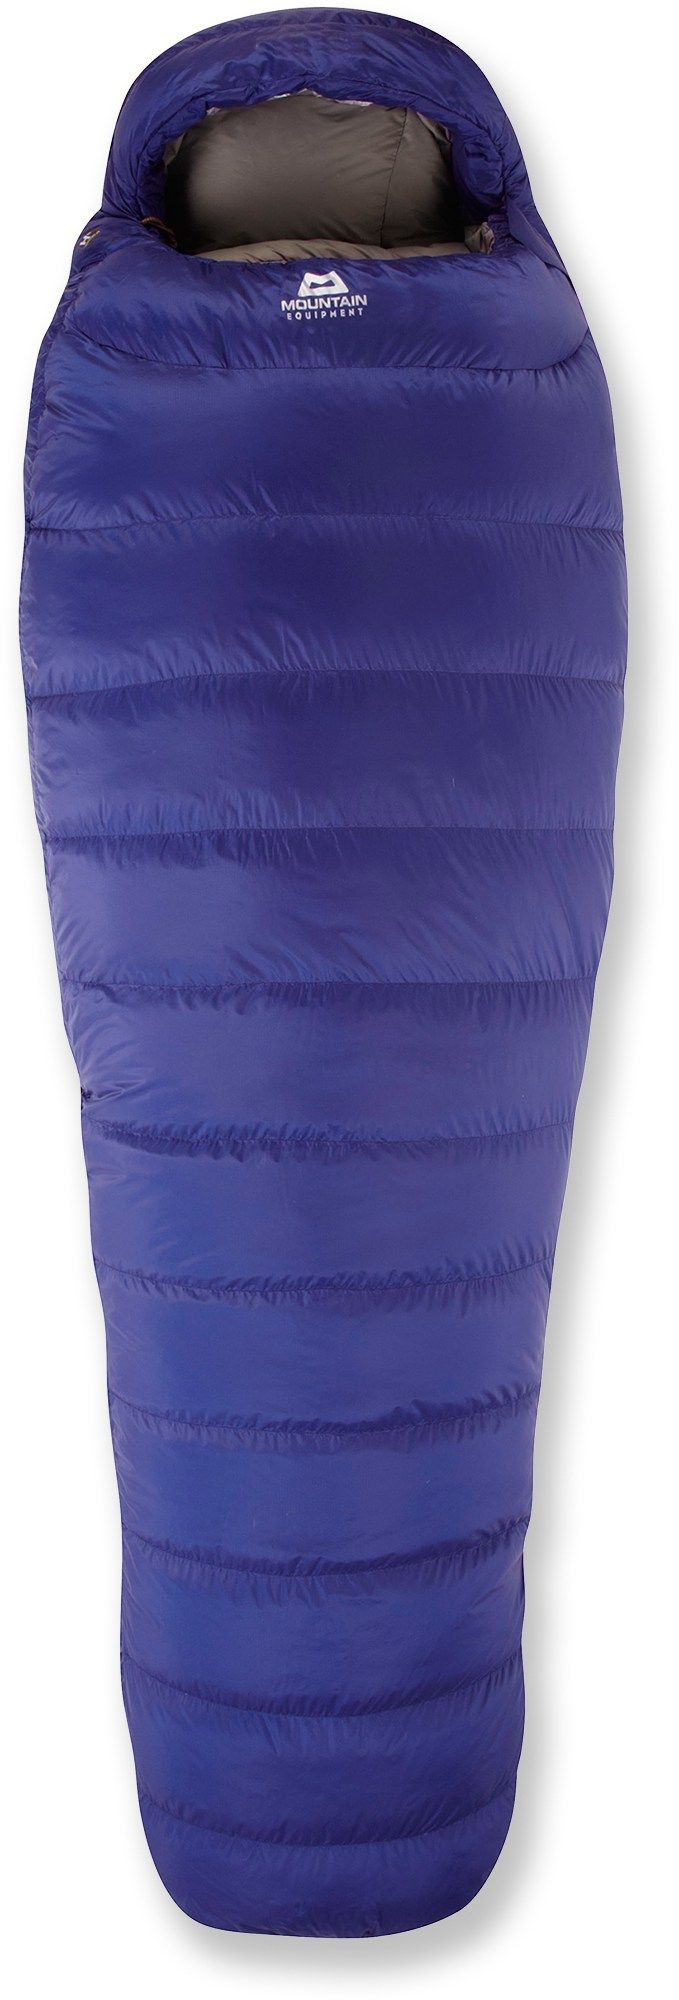 Mountain Equipment Helium 400 Sleeping Bag Women's REI